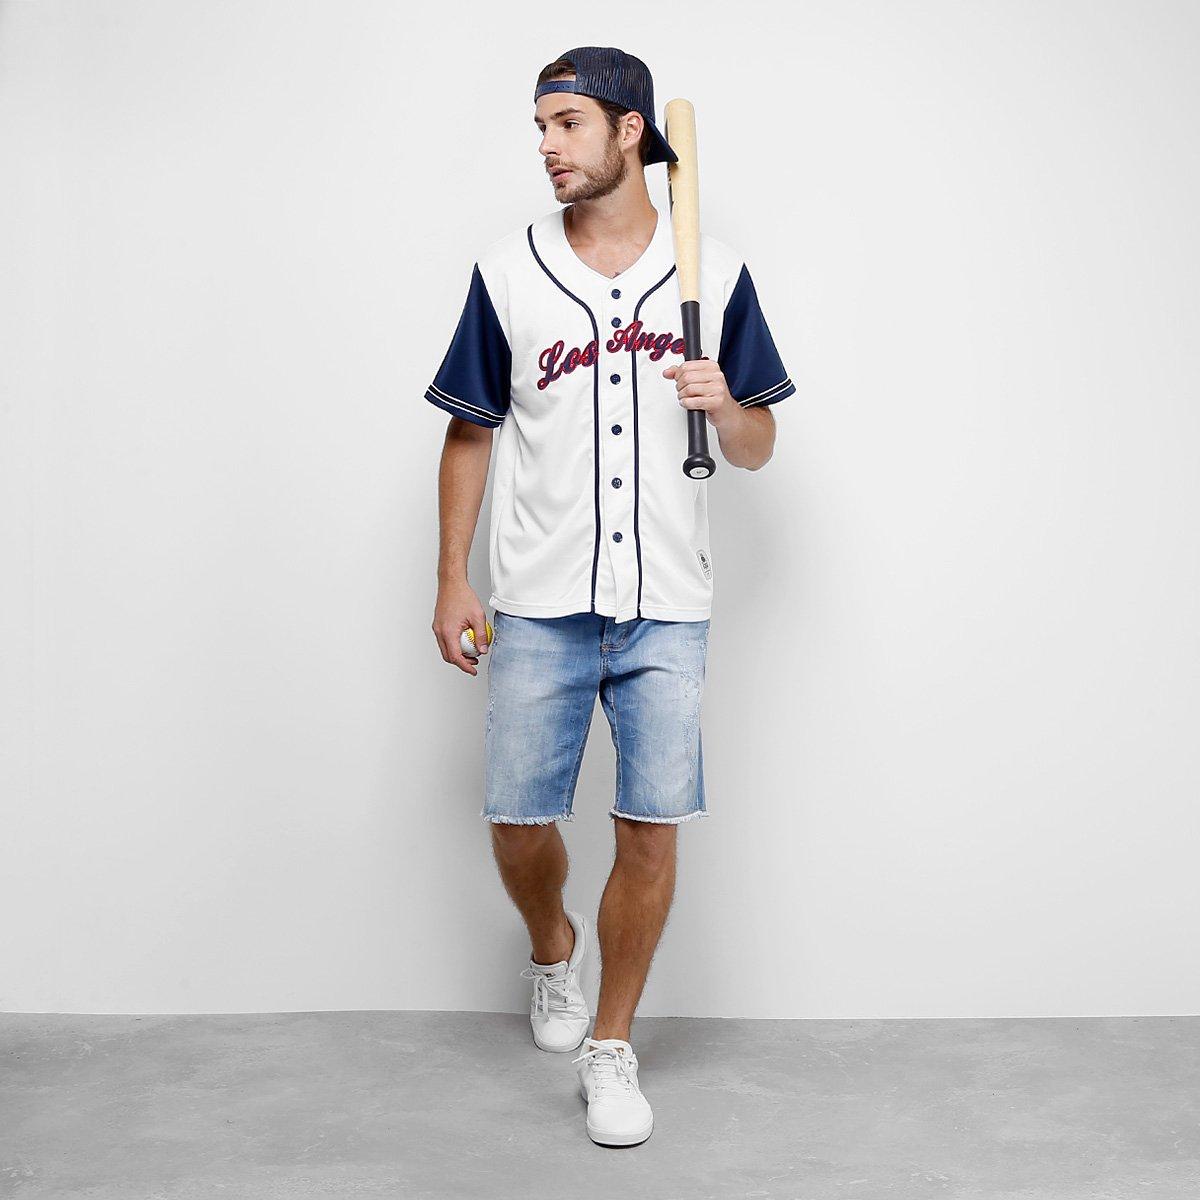 6e7f69a66 Camisa Baseball Kappa Los Angeles 17 Masculina - Compre Agora